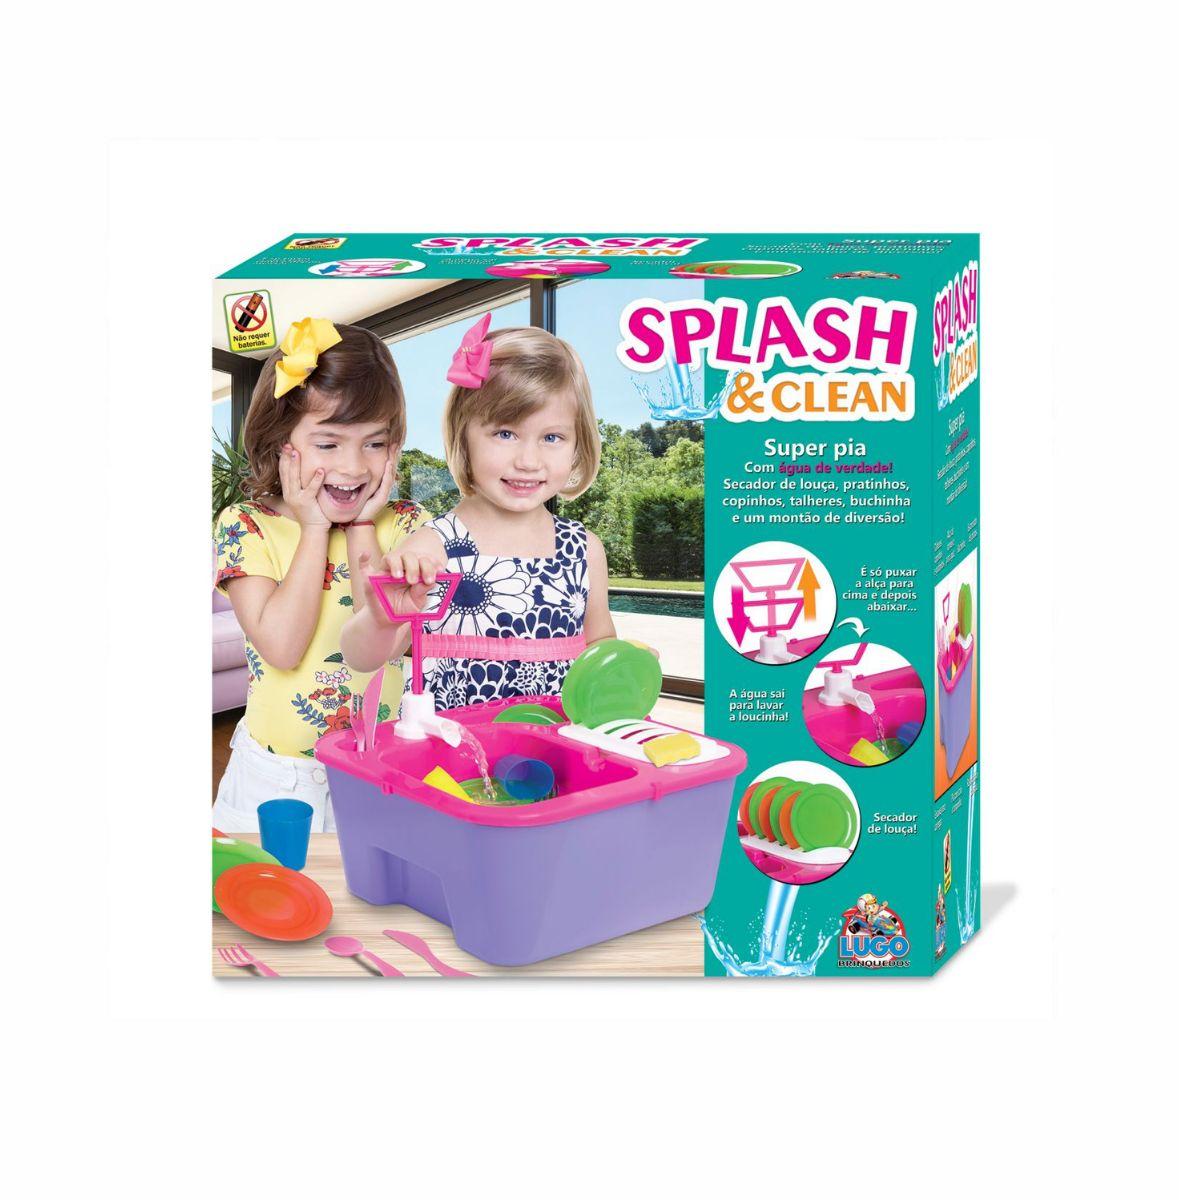 Pia de Brinquedo Splash e Clean Infantil Super Divertido Lugo